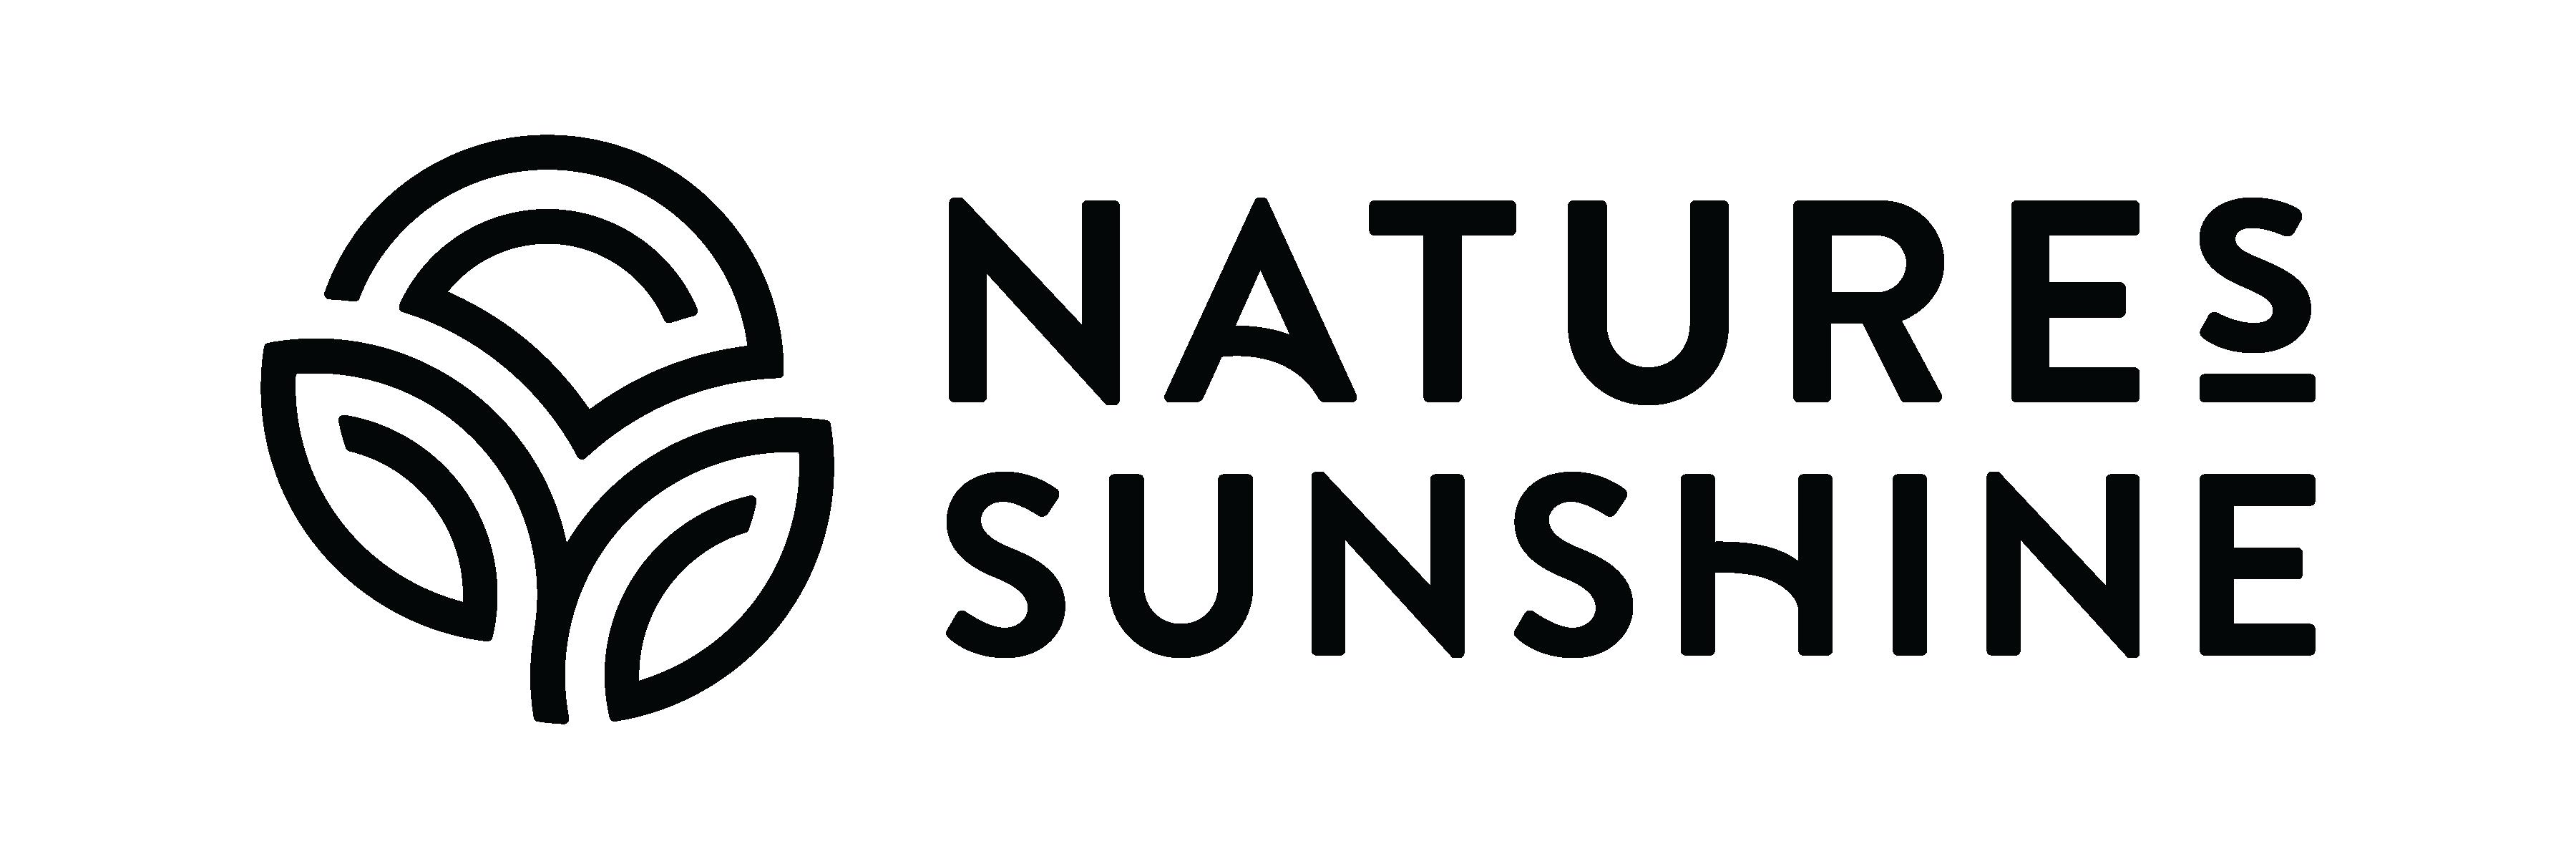 Ns logo primary black